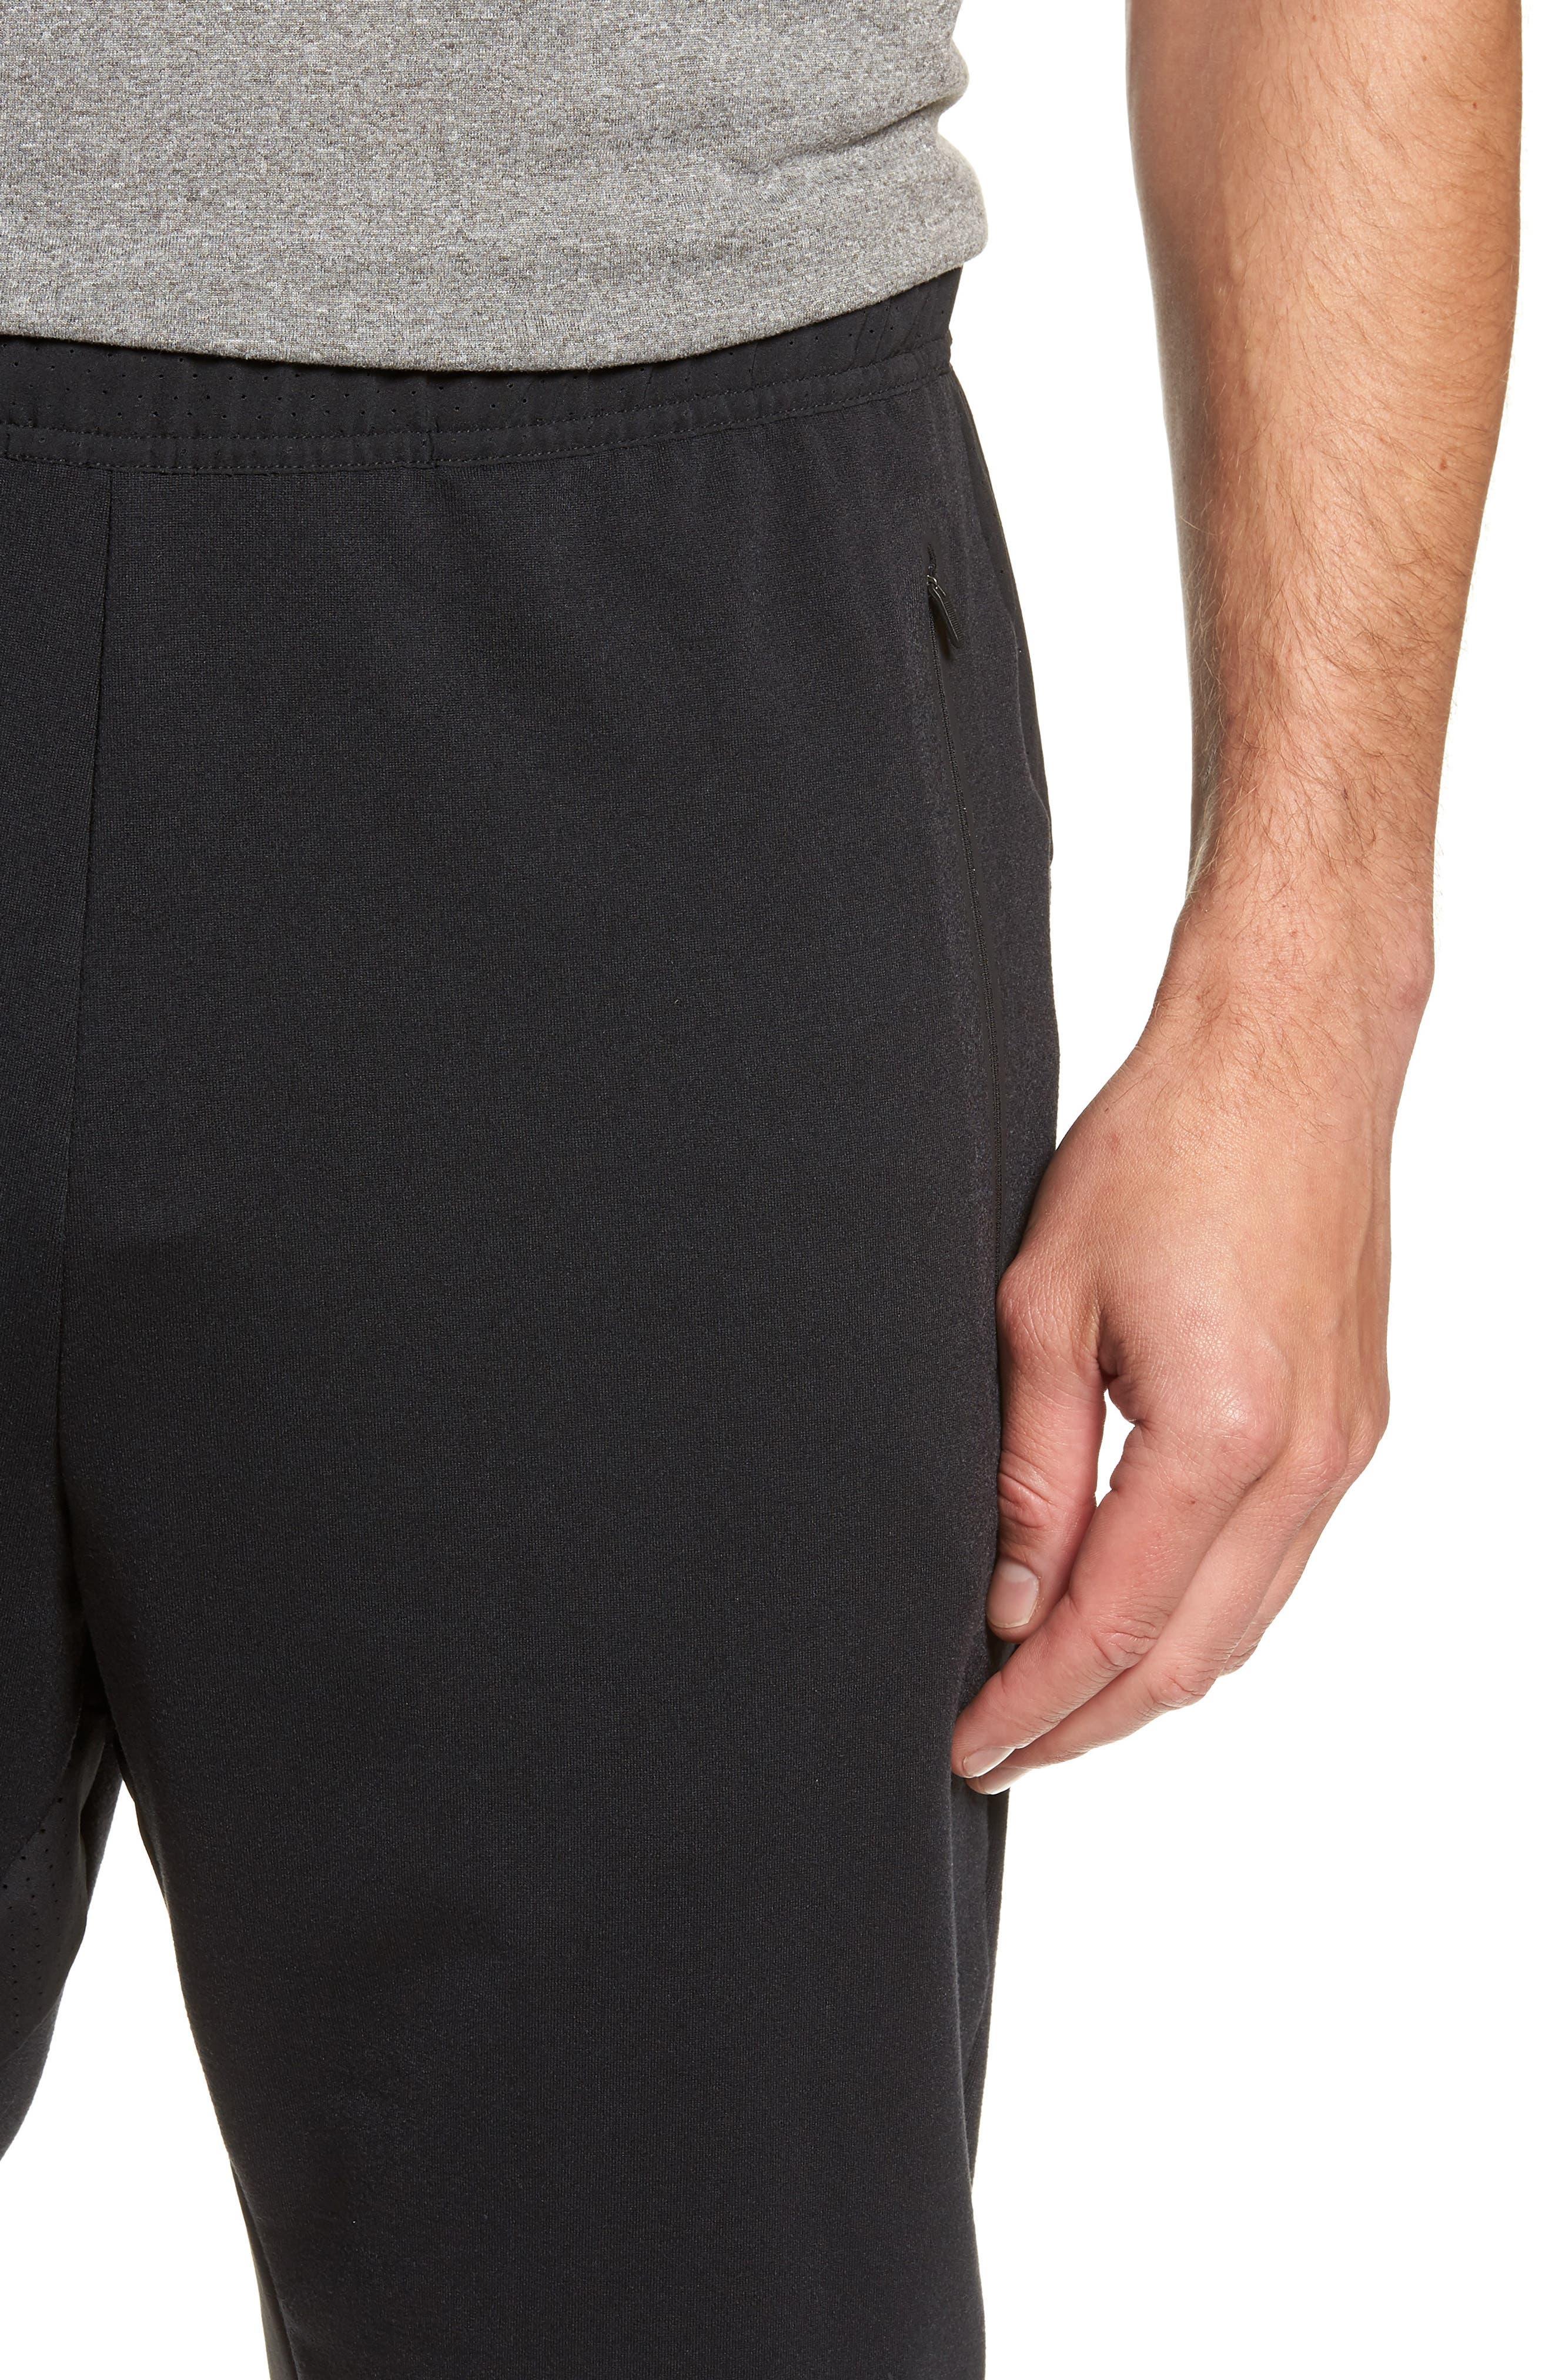 Dry Max Training Shorts,                             Alternate thumbnail 4, color,                             010